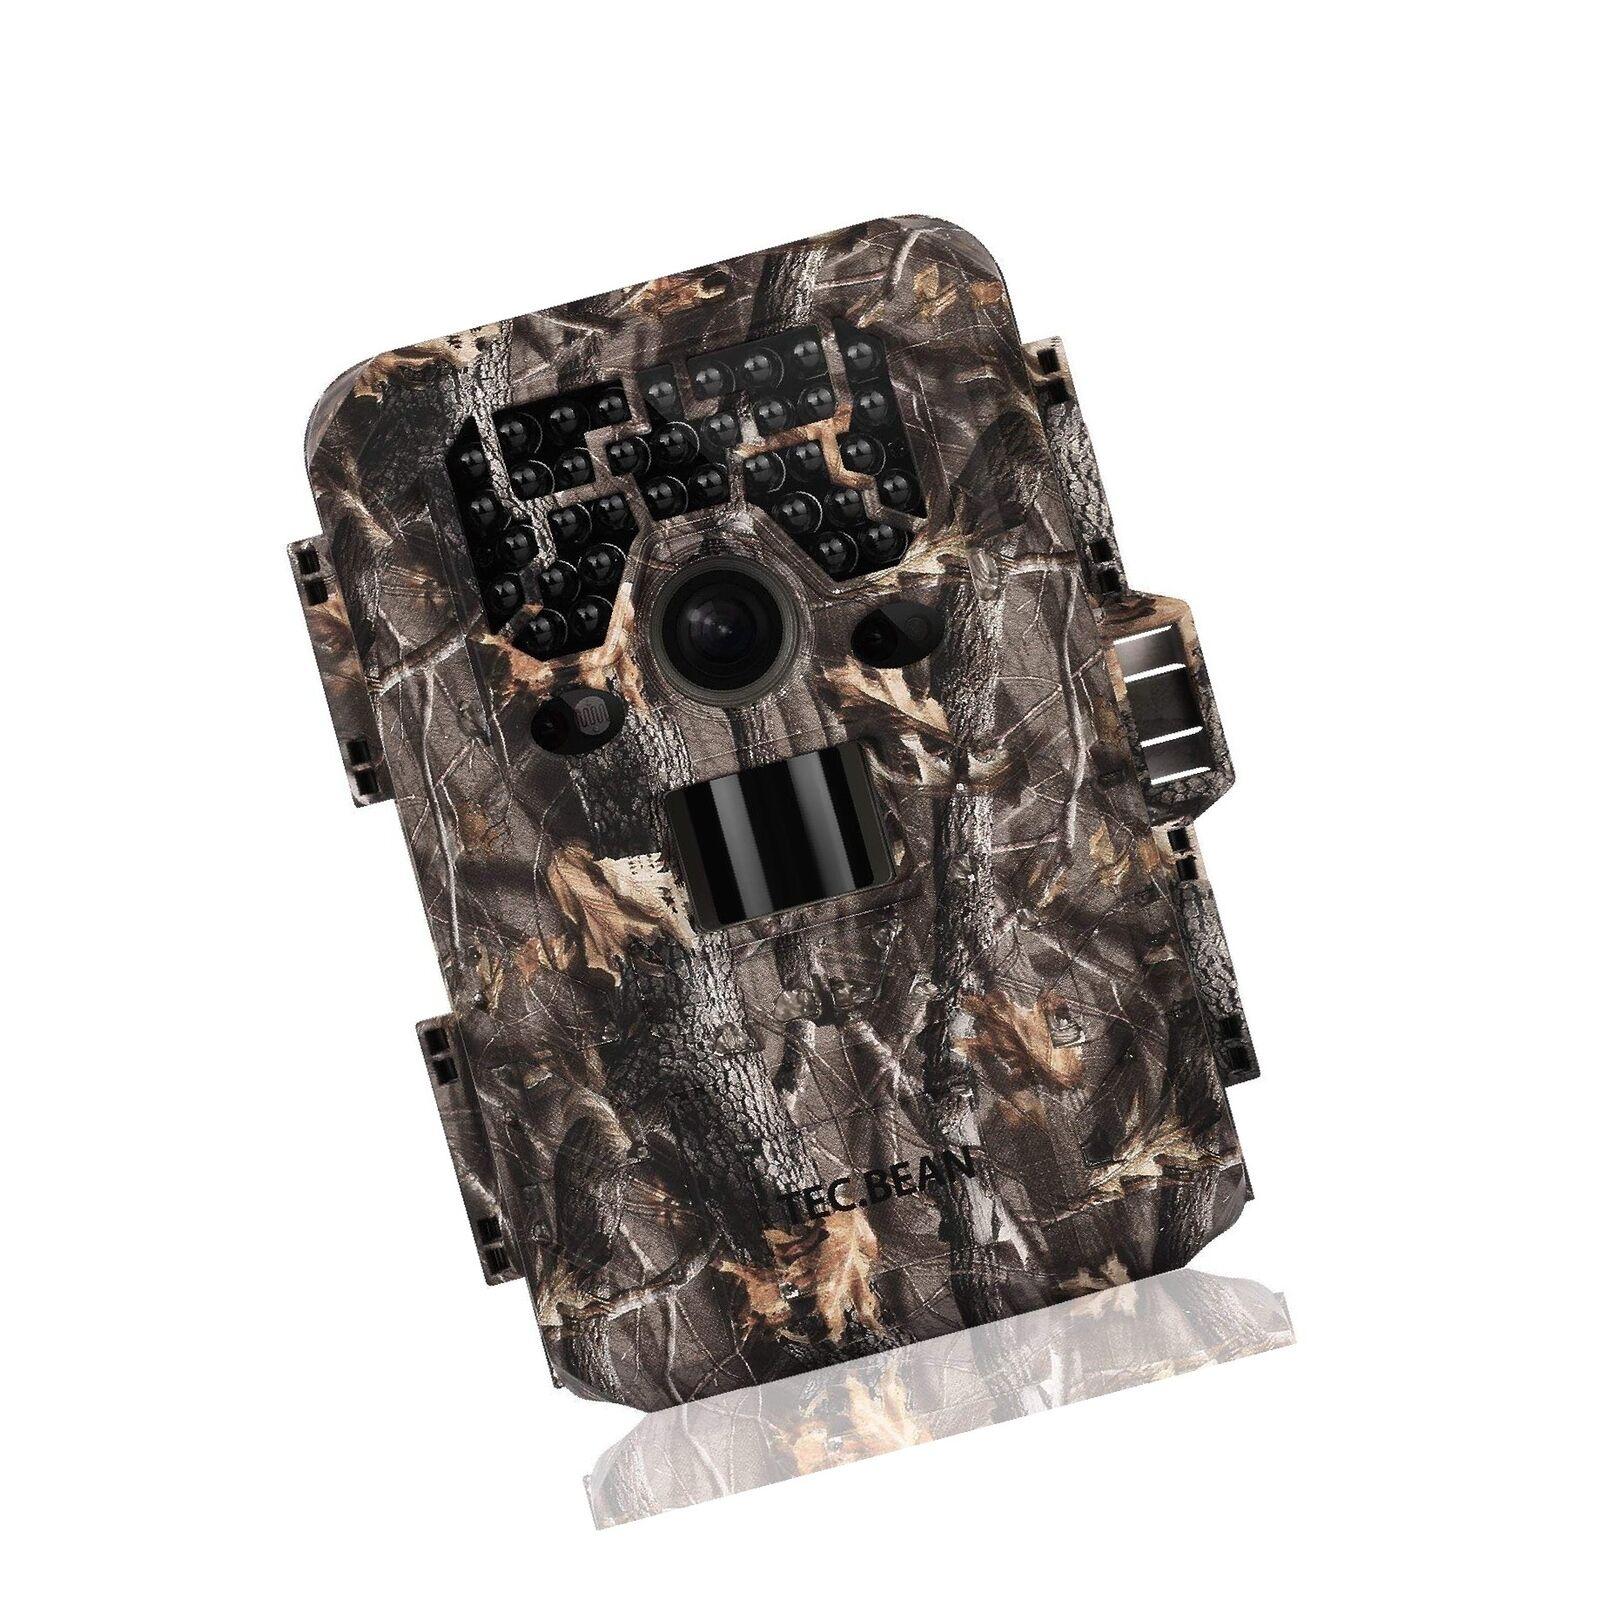 TEC.BEAN Trail Camera 12MP 1080P Full HD Game & Hunting Camera ... Free Shipping